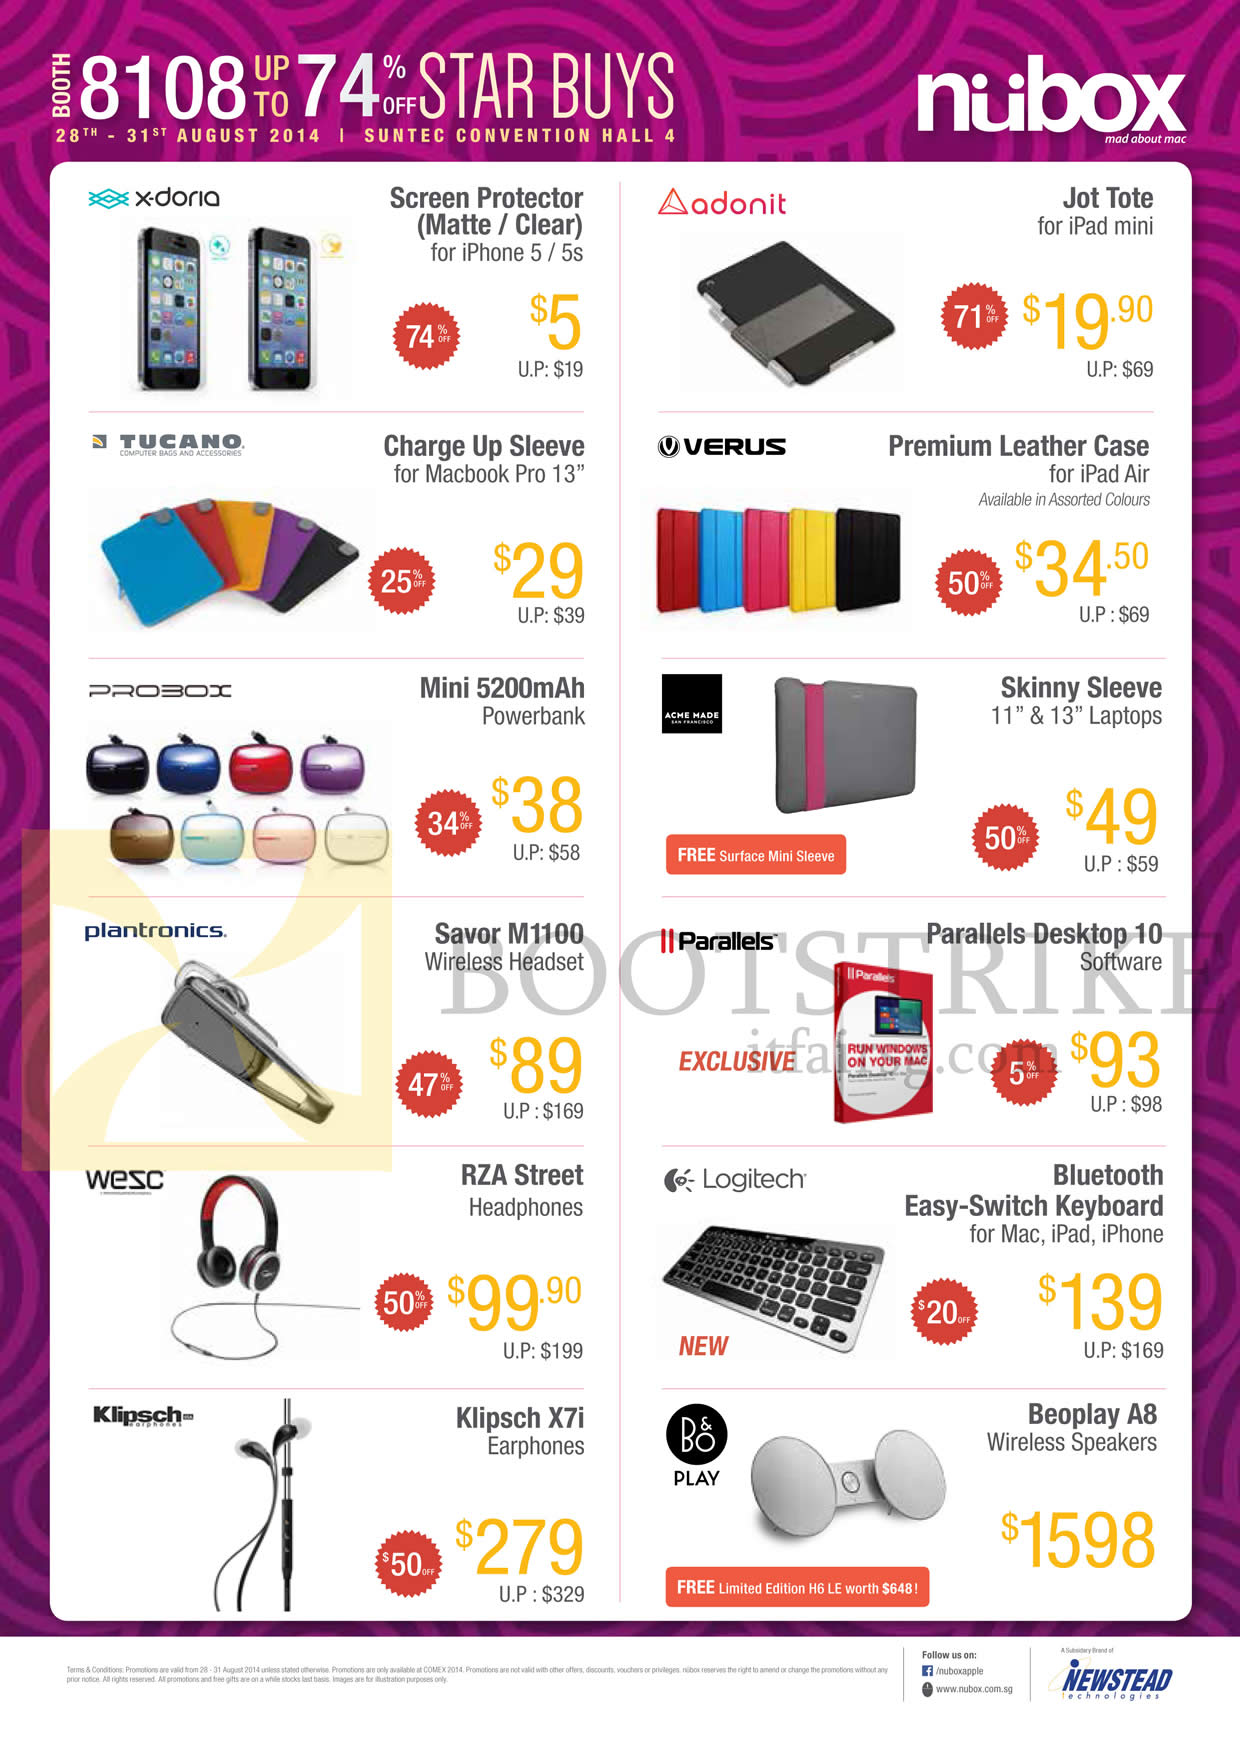 COMEX 2014 price list image brochure of Nubox Accessories Headphones, Powerbank, Earphones, Software, Wireless Speakers, Laptop Sleeves, Screen Protectors, Macbook Sleeves